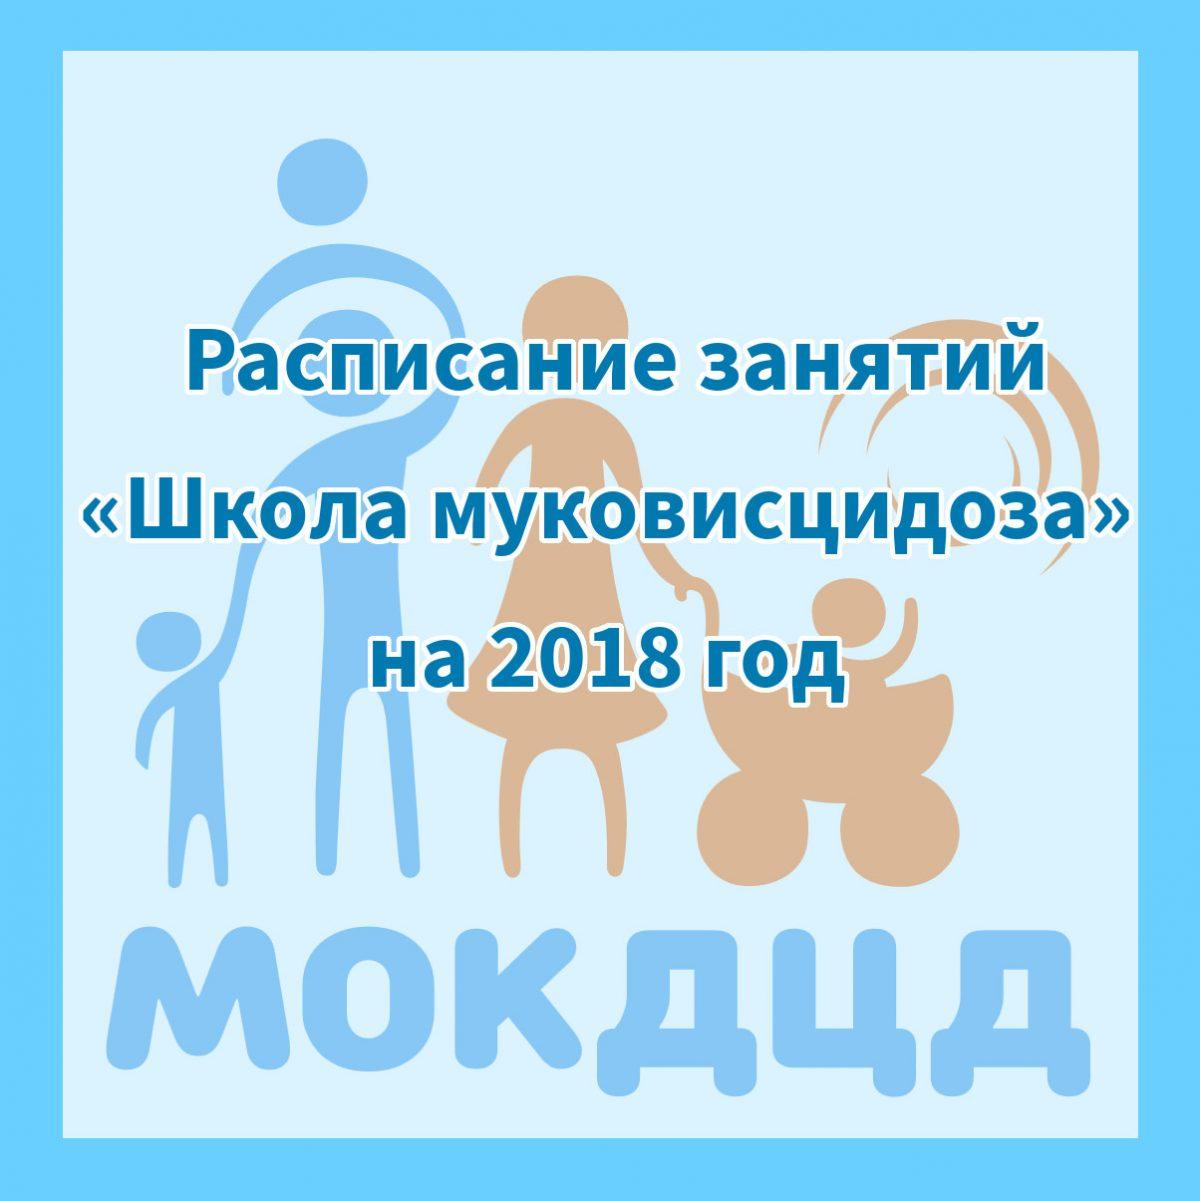 Расписание занятий «Школа муковисцидоза» на 2018 год